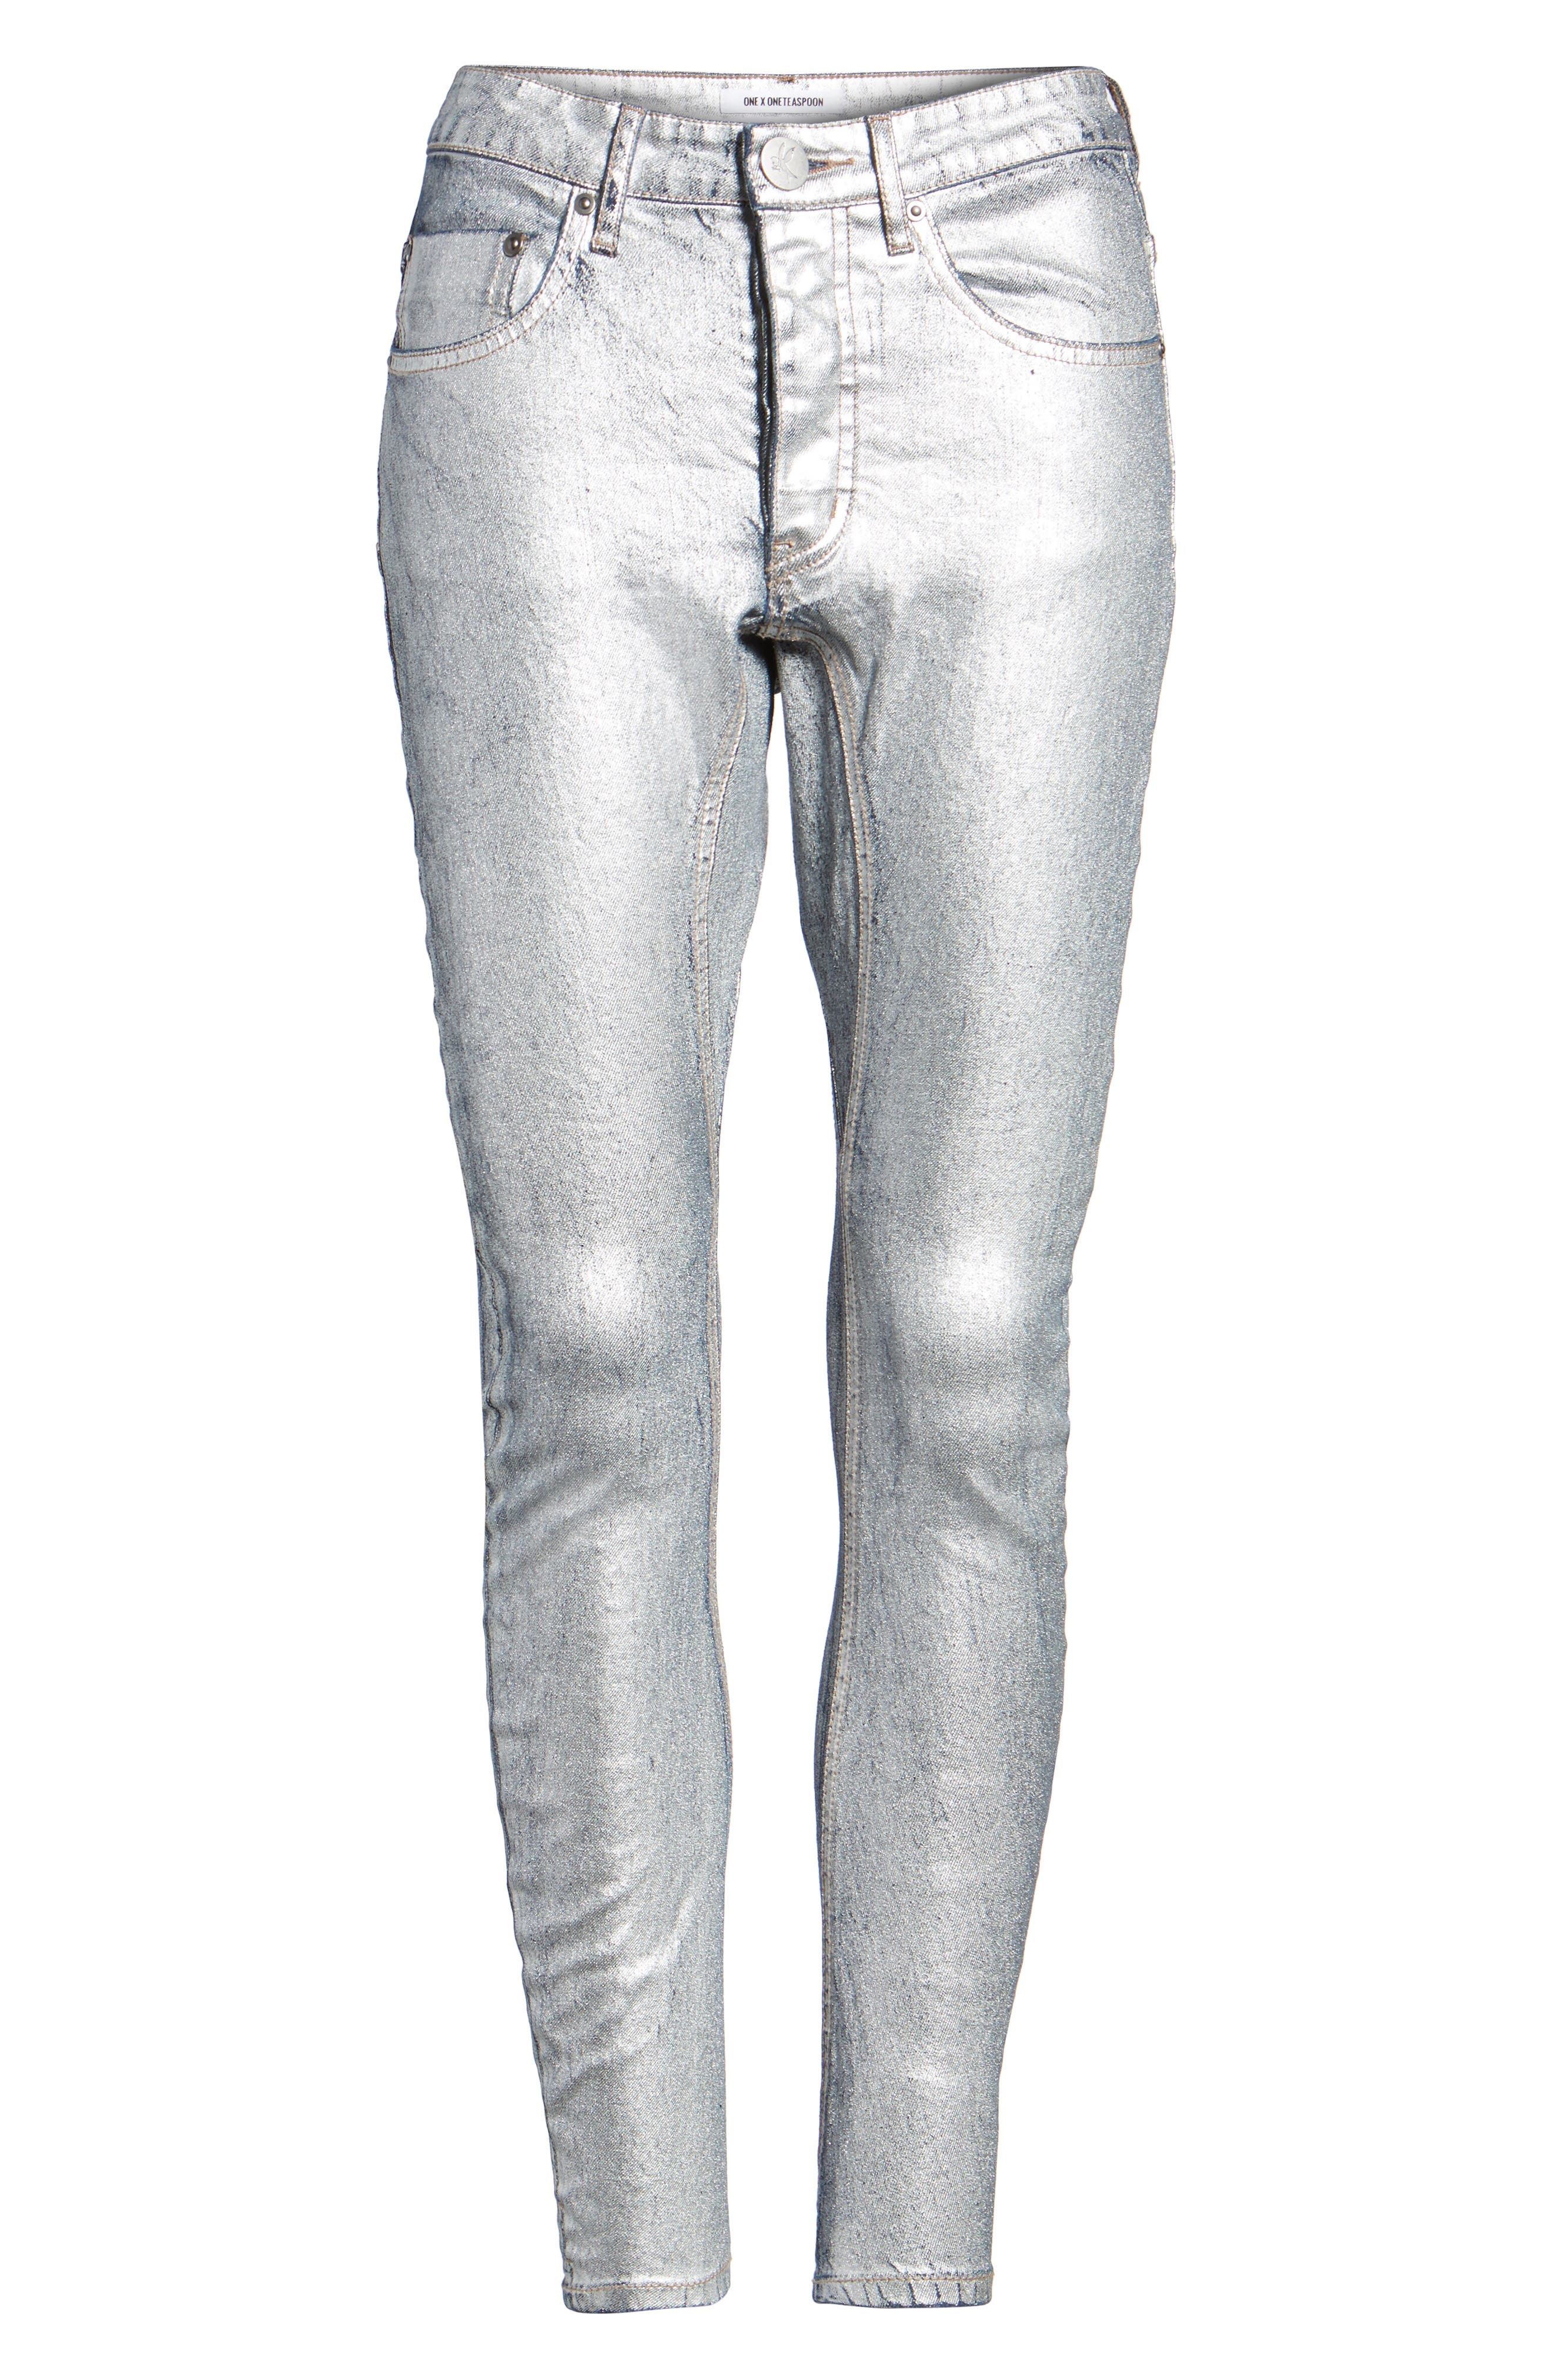 Kidds Metallic Drop Crotch Skinny Jeans,                             Alternate thumbnail 6, color,                             040